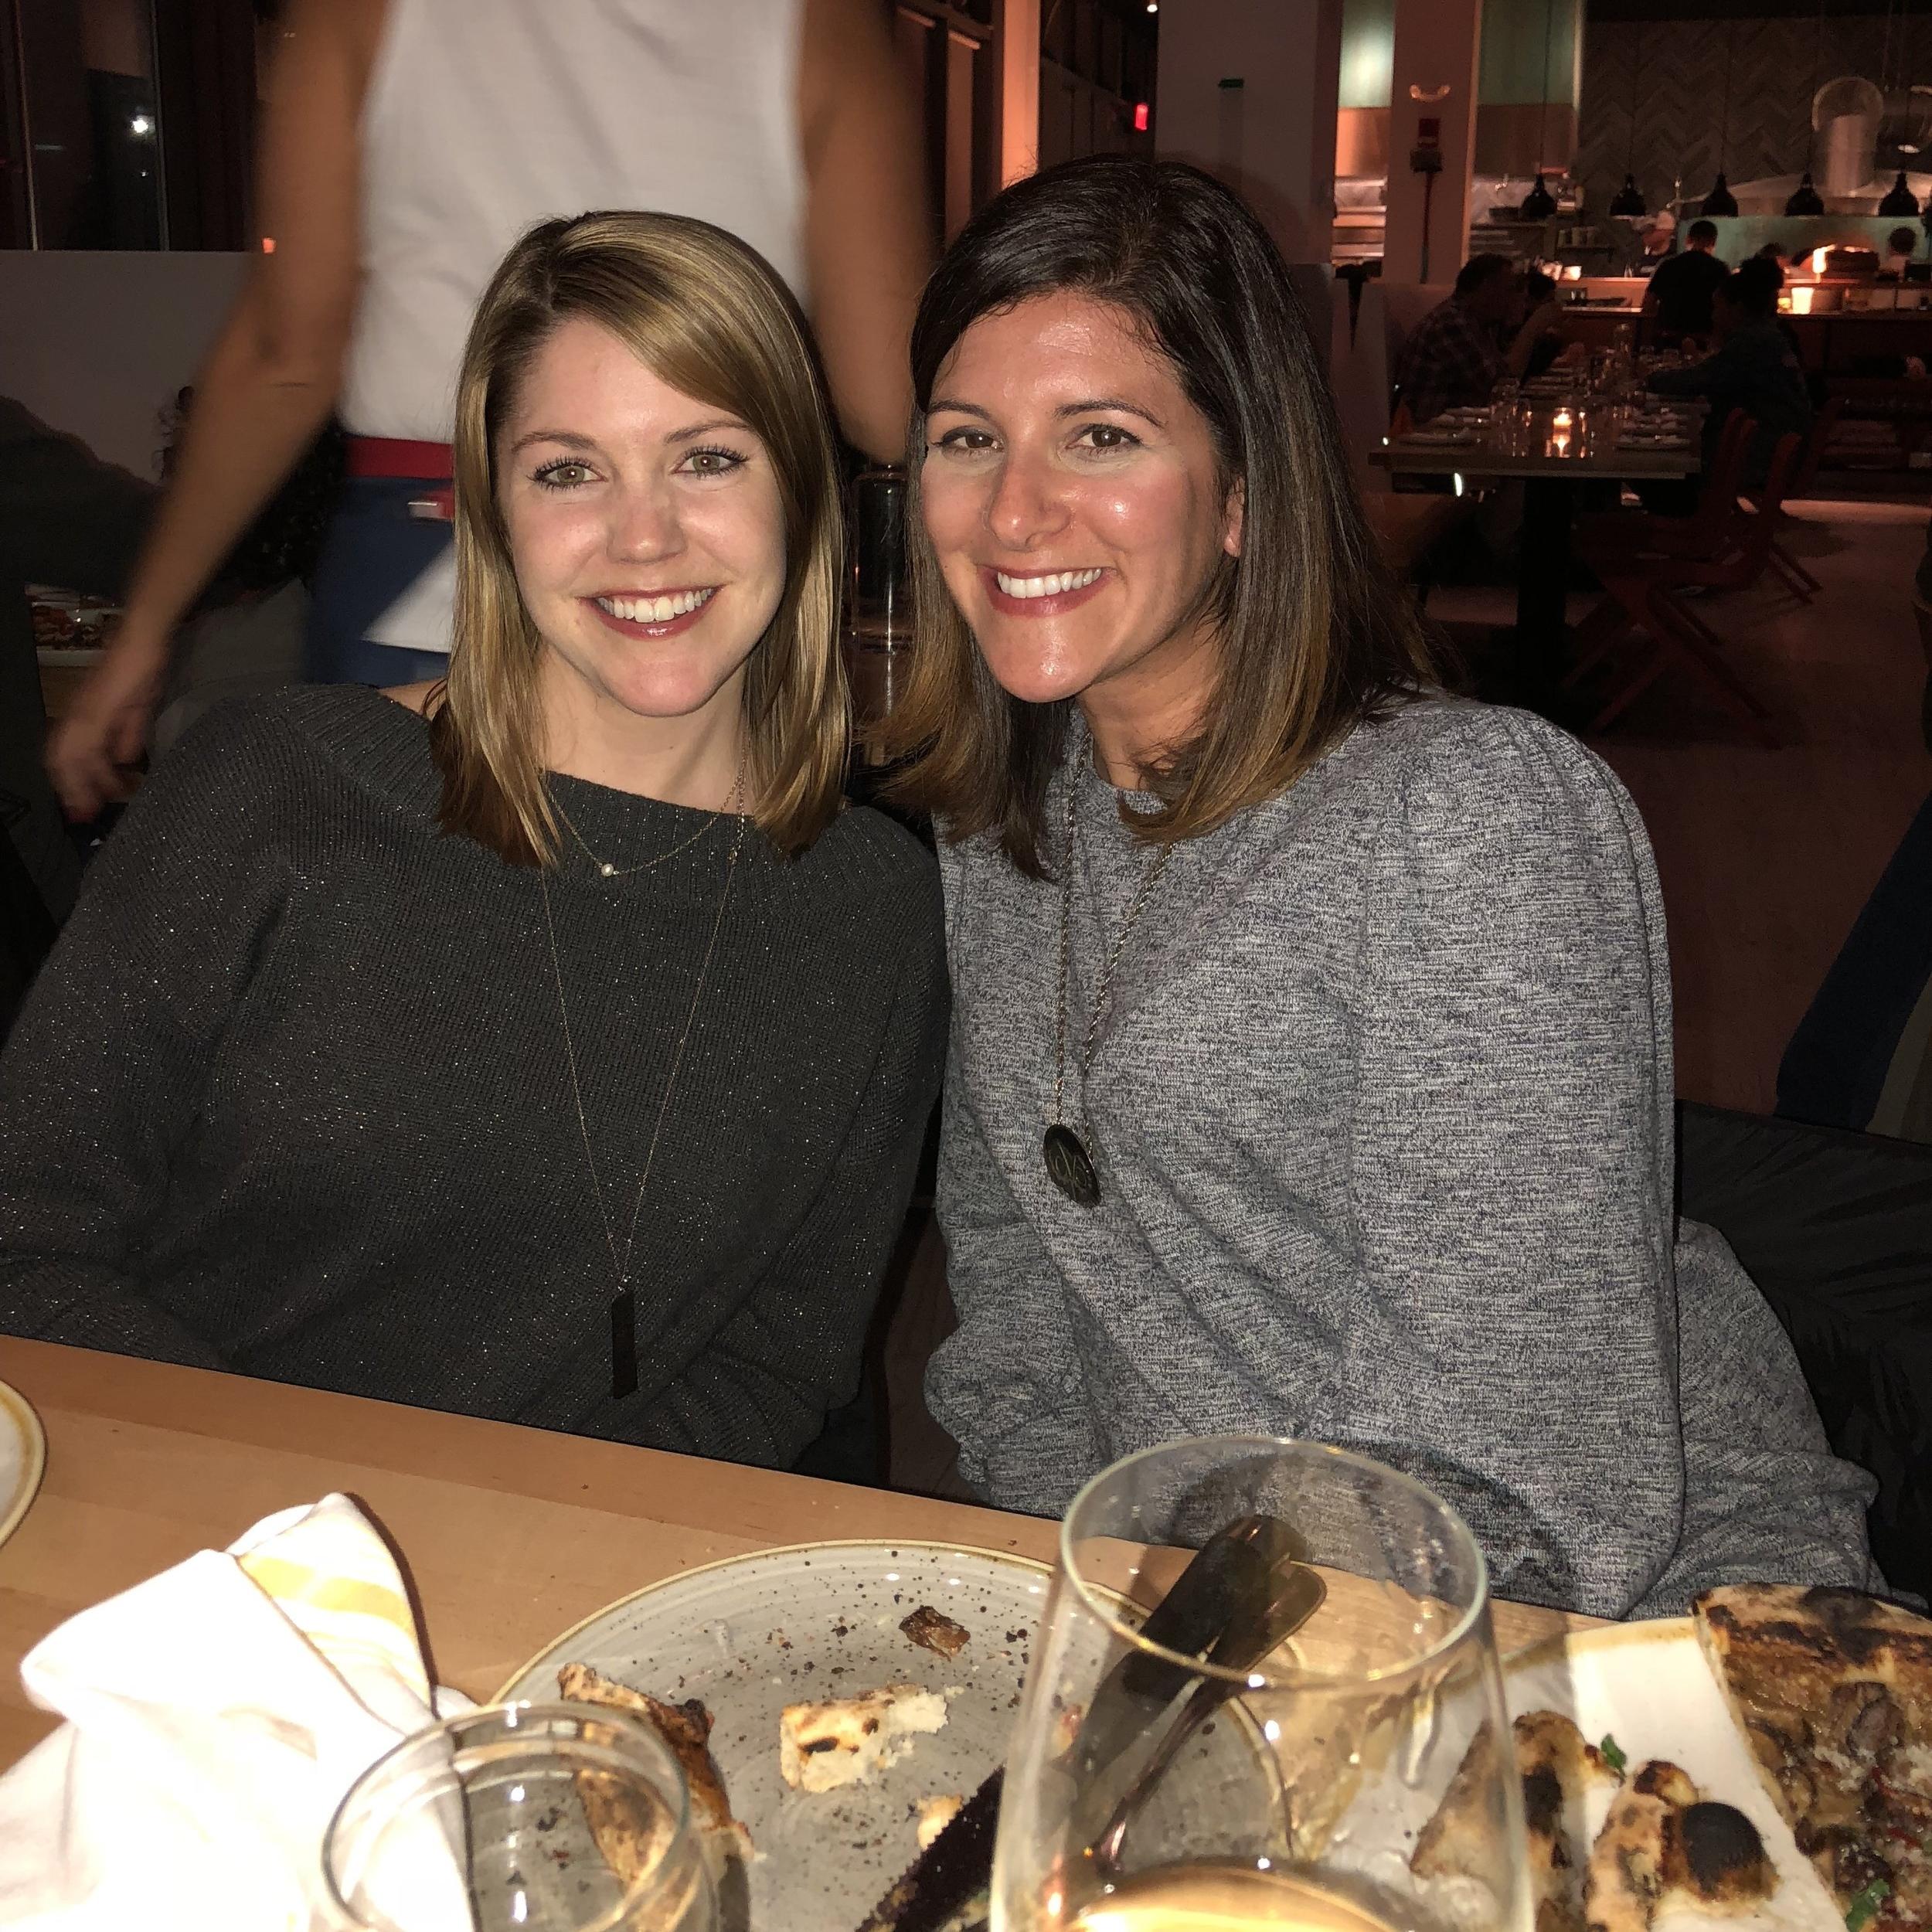 Reunited with my dear friend Katrina!